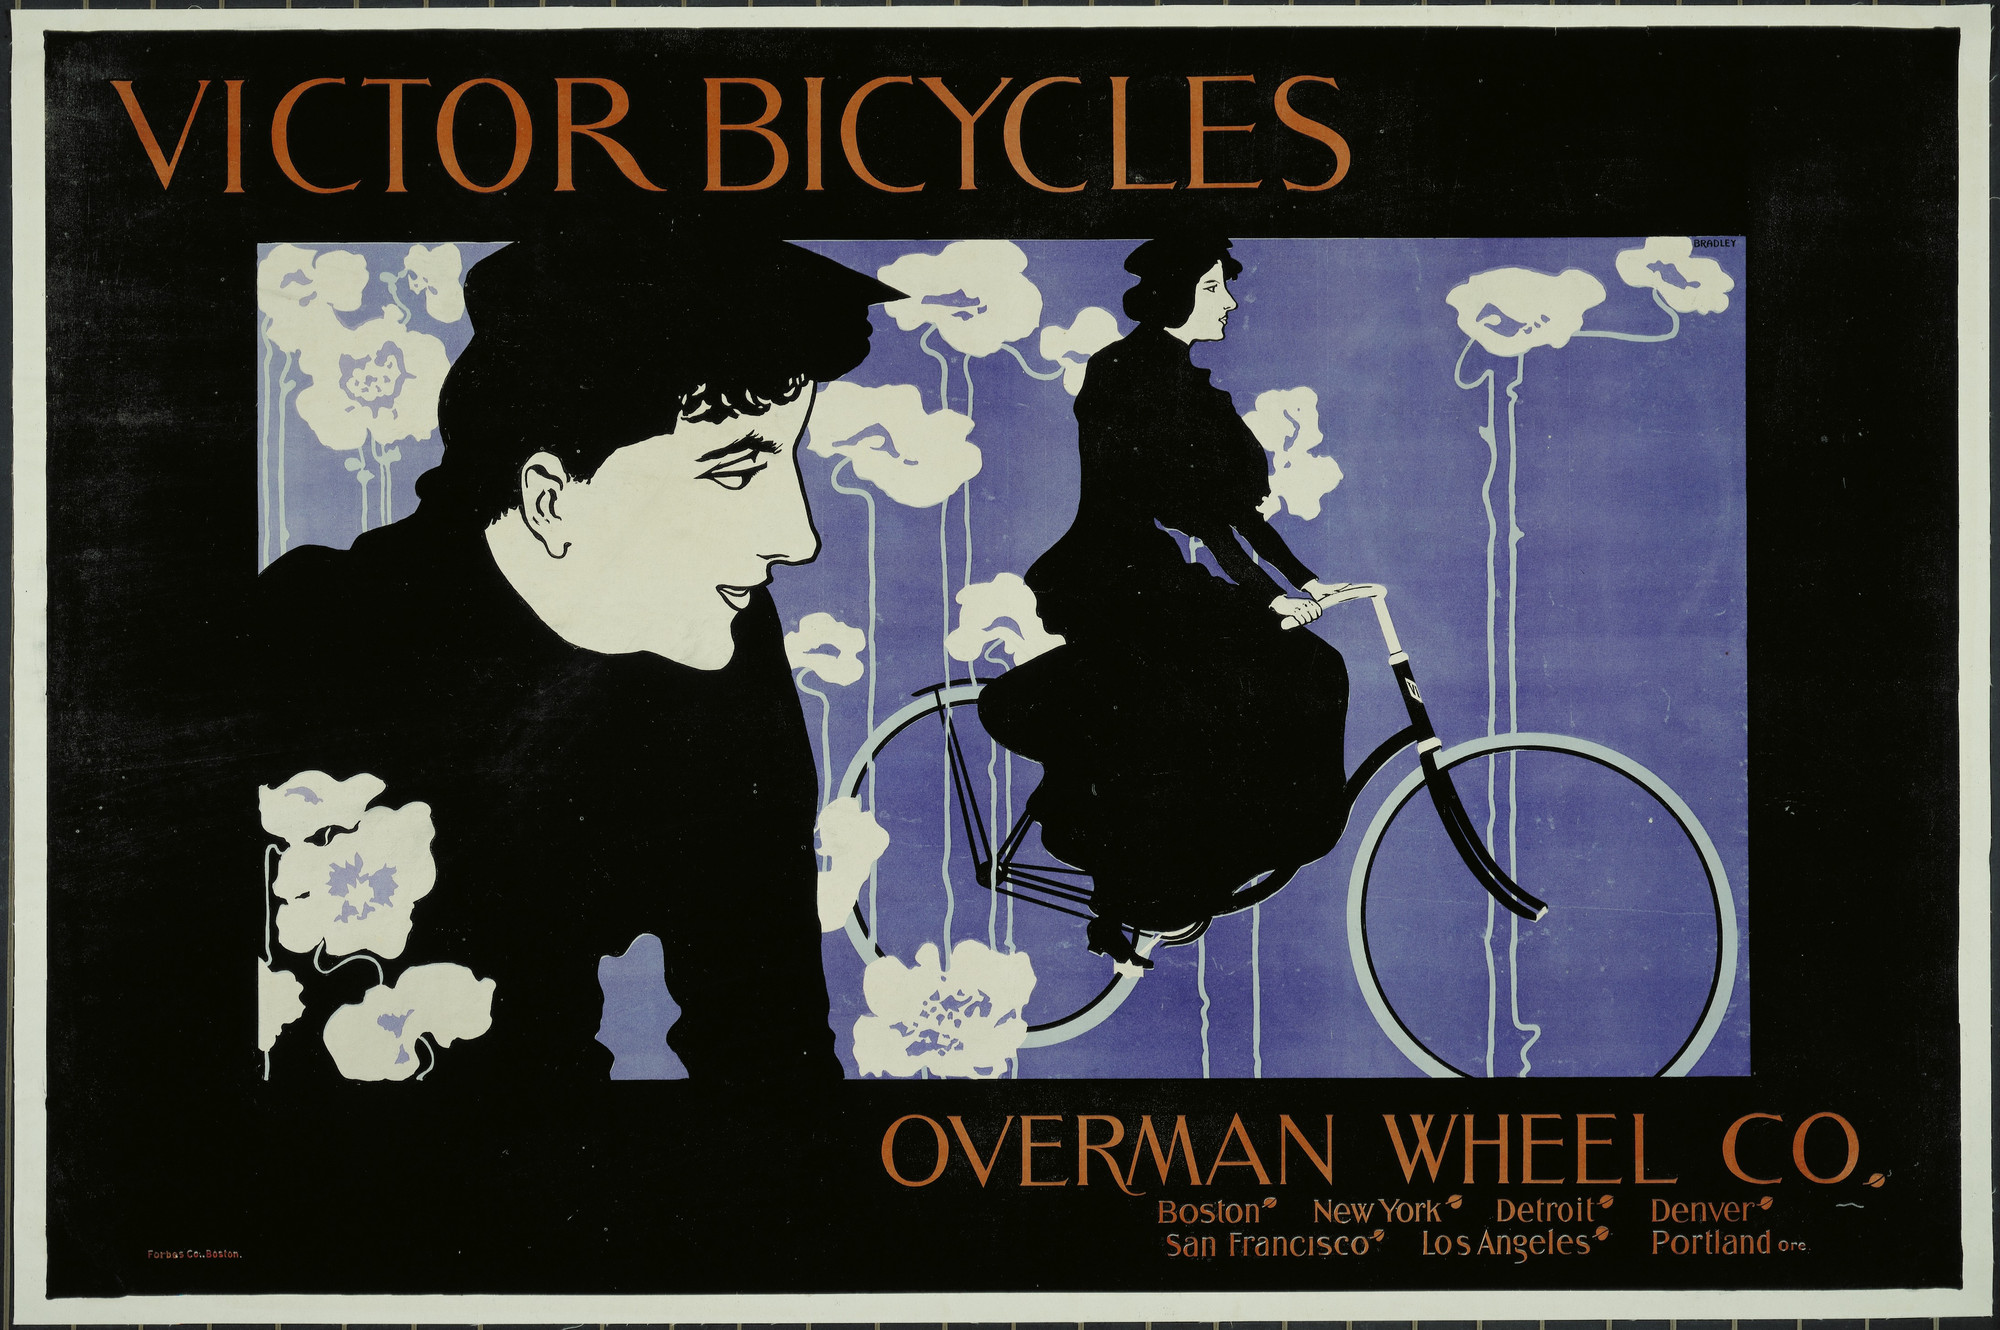 William Bradley Victor Bicycles Overman Wheel Co C 1895 Moma